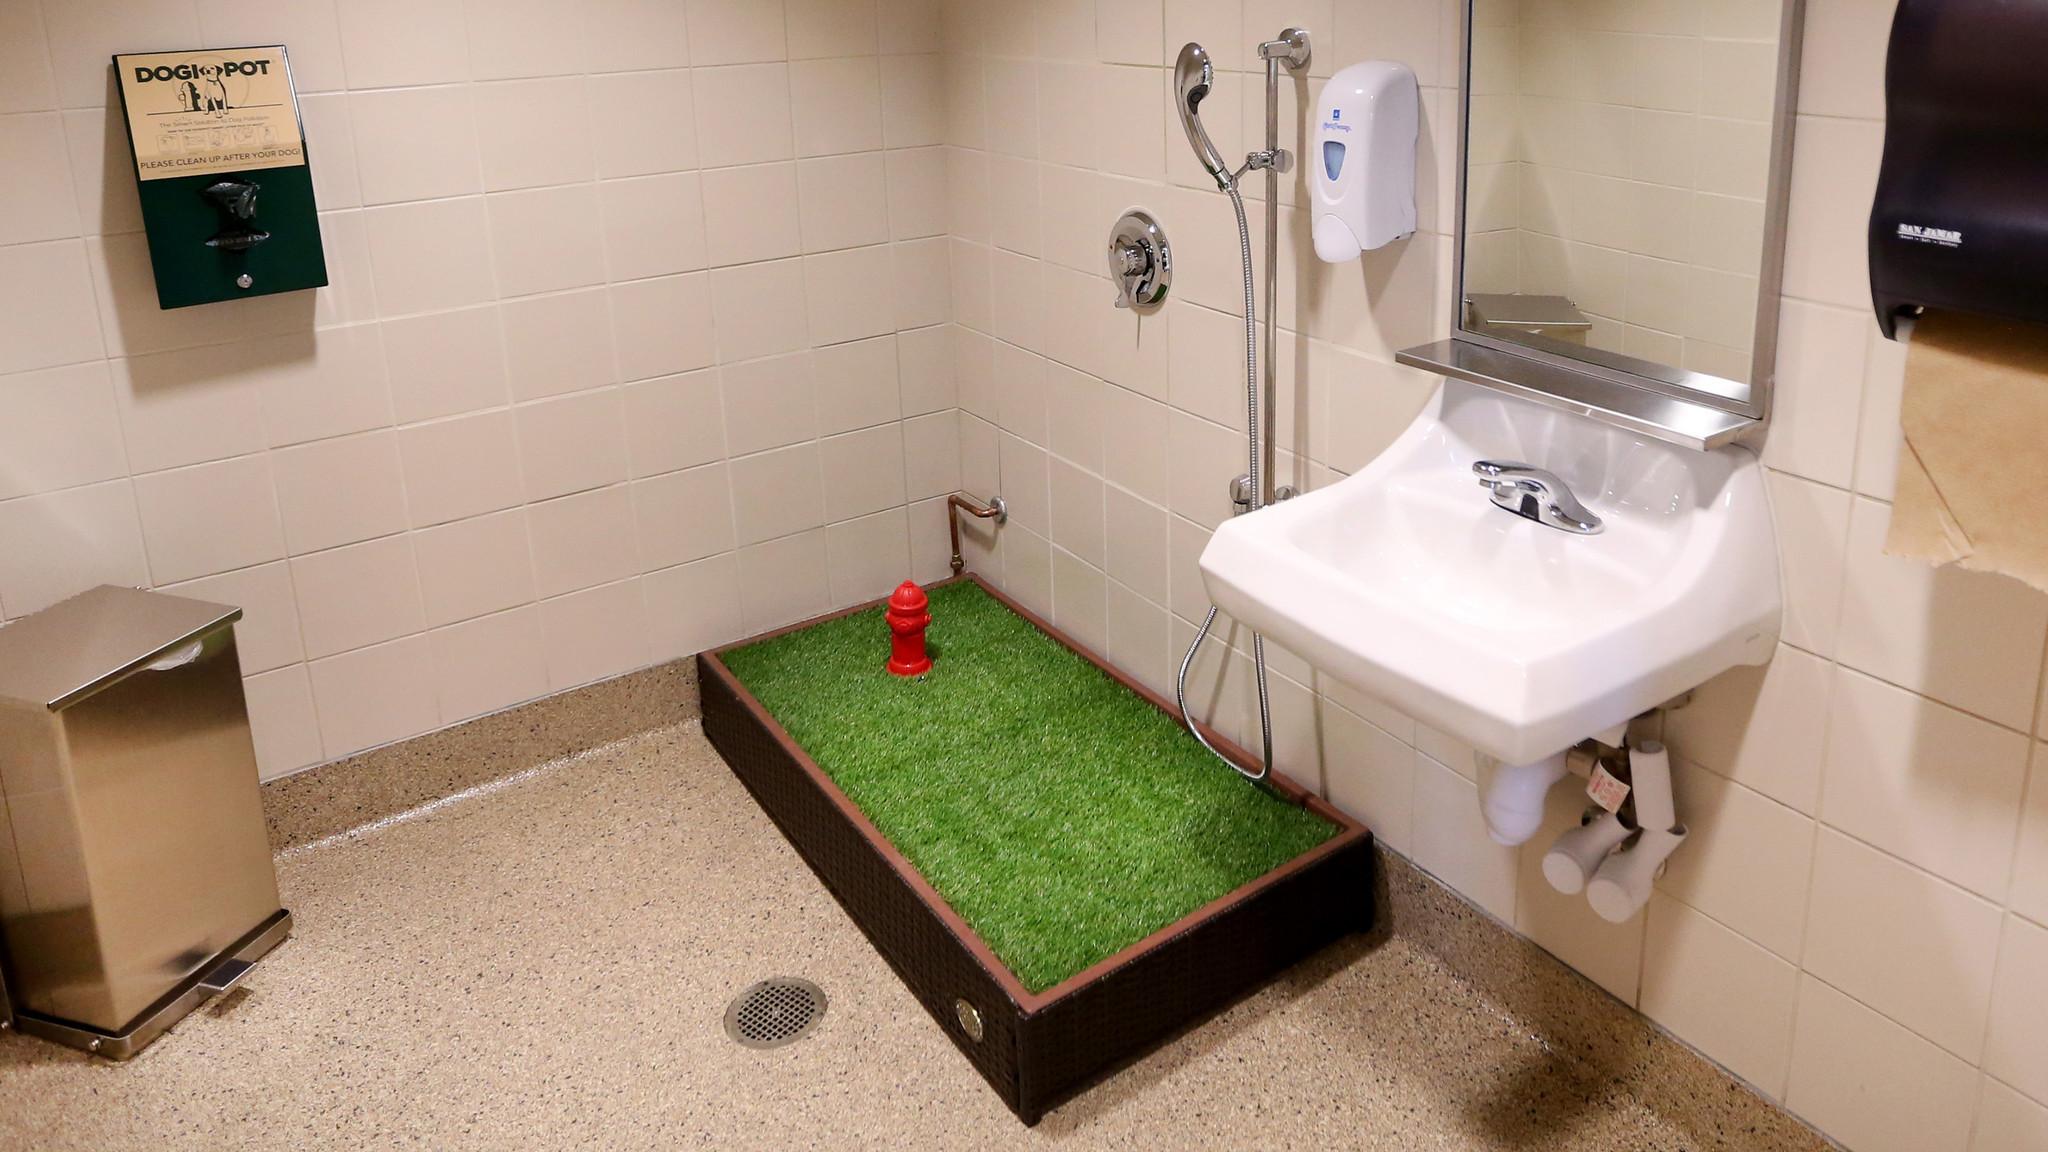 Midway Airport Opens Pet Bathroom Chicago Tribune